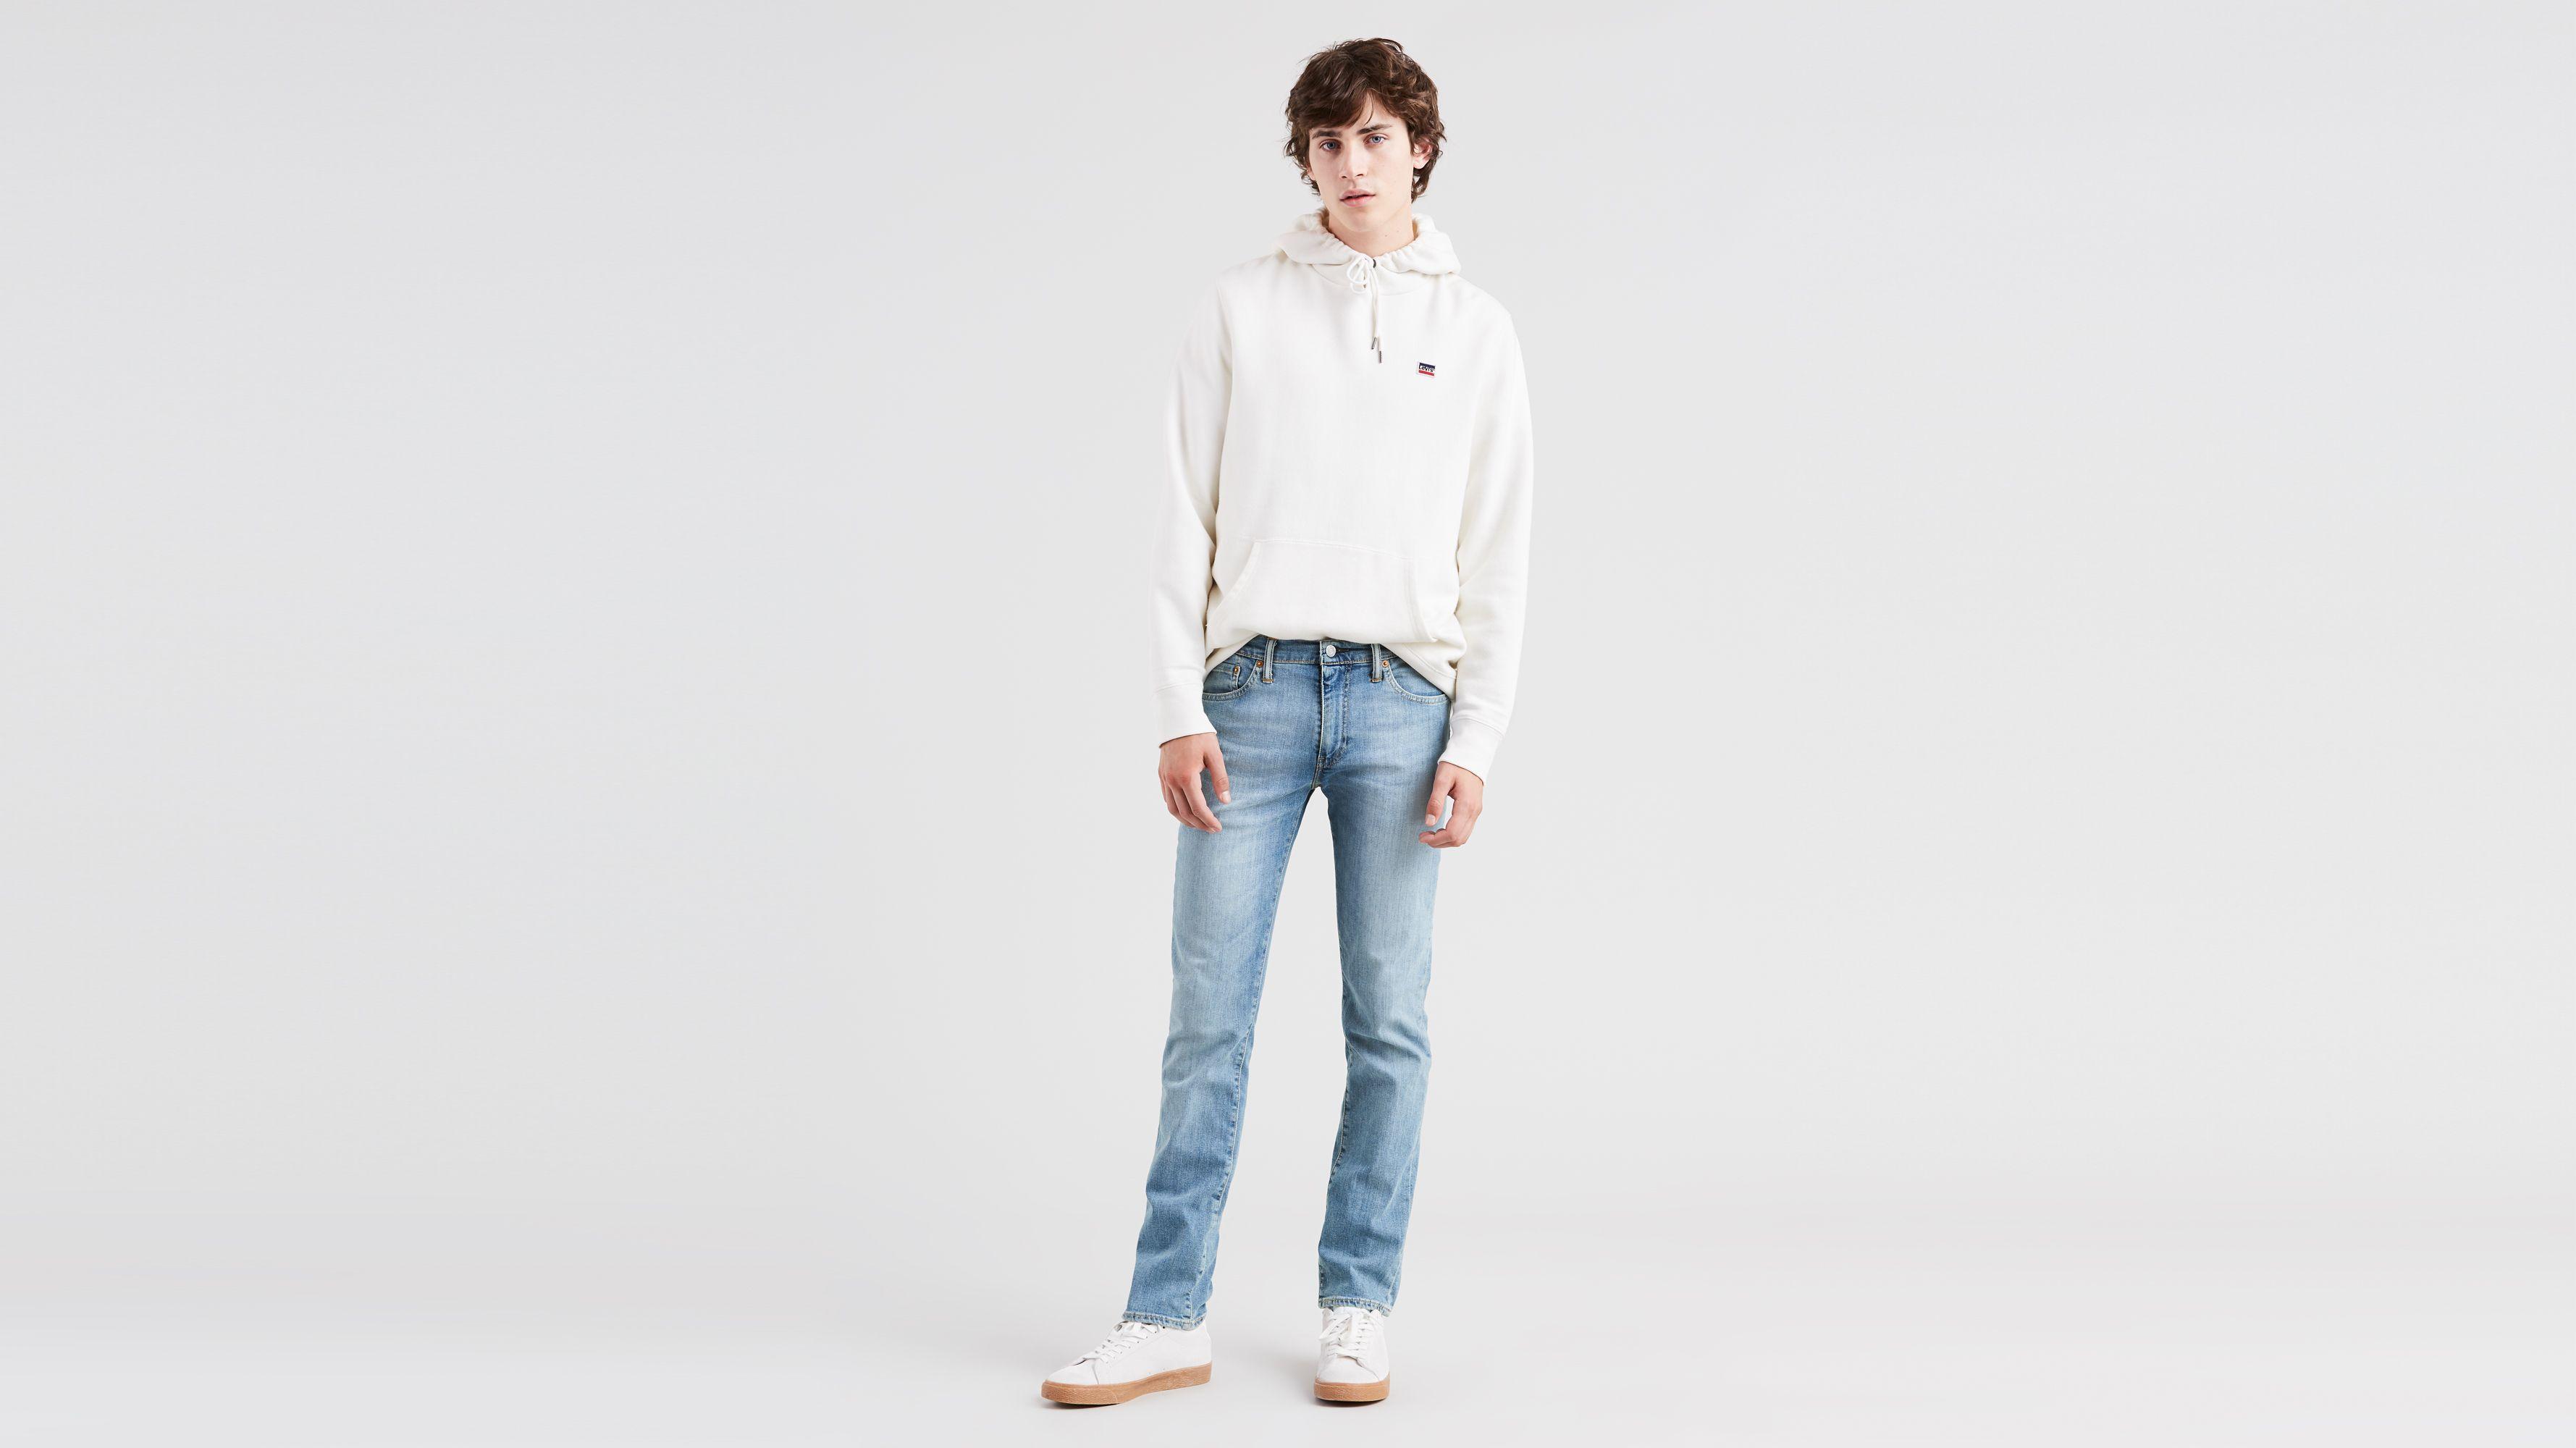 Vêtements Vêtements 511 511 511 Vêtements 511 Vêtements zqfIUI